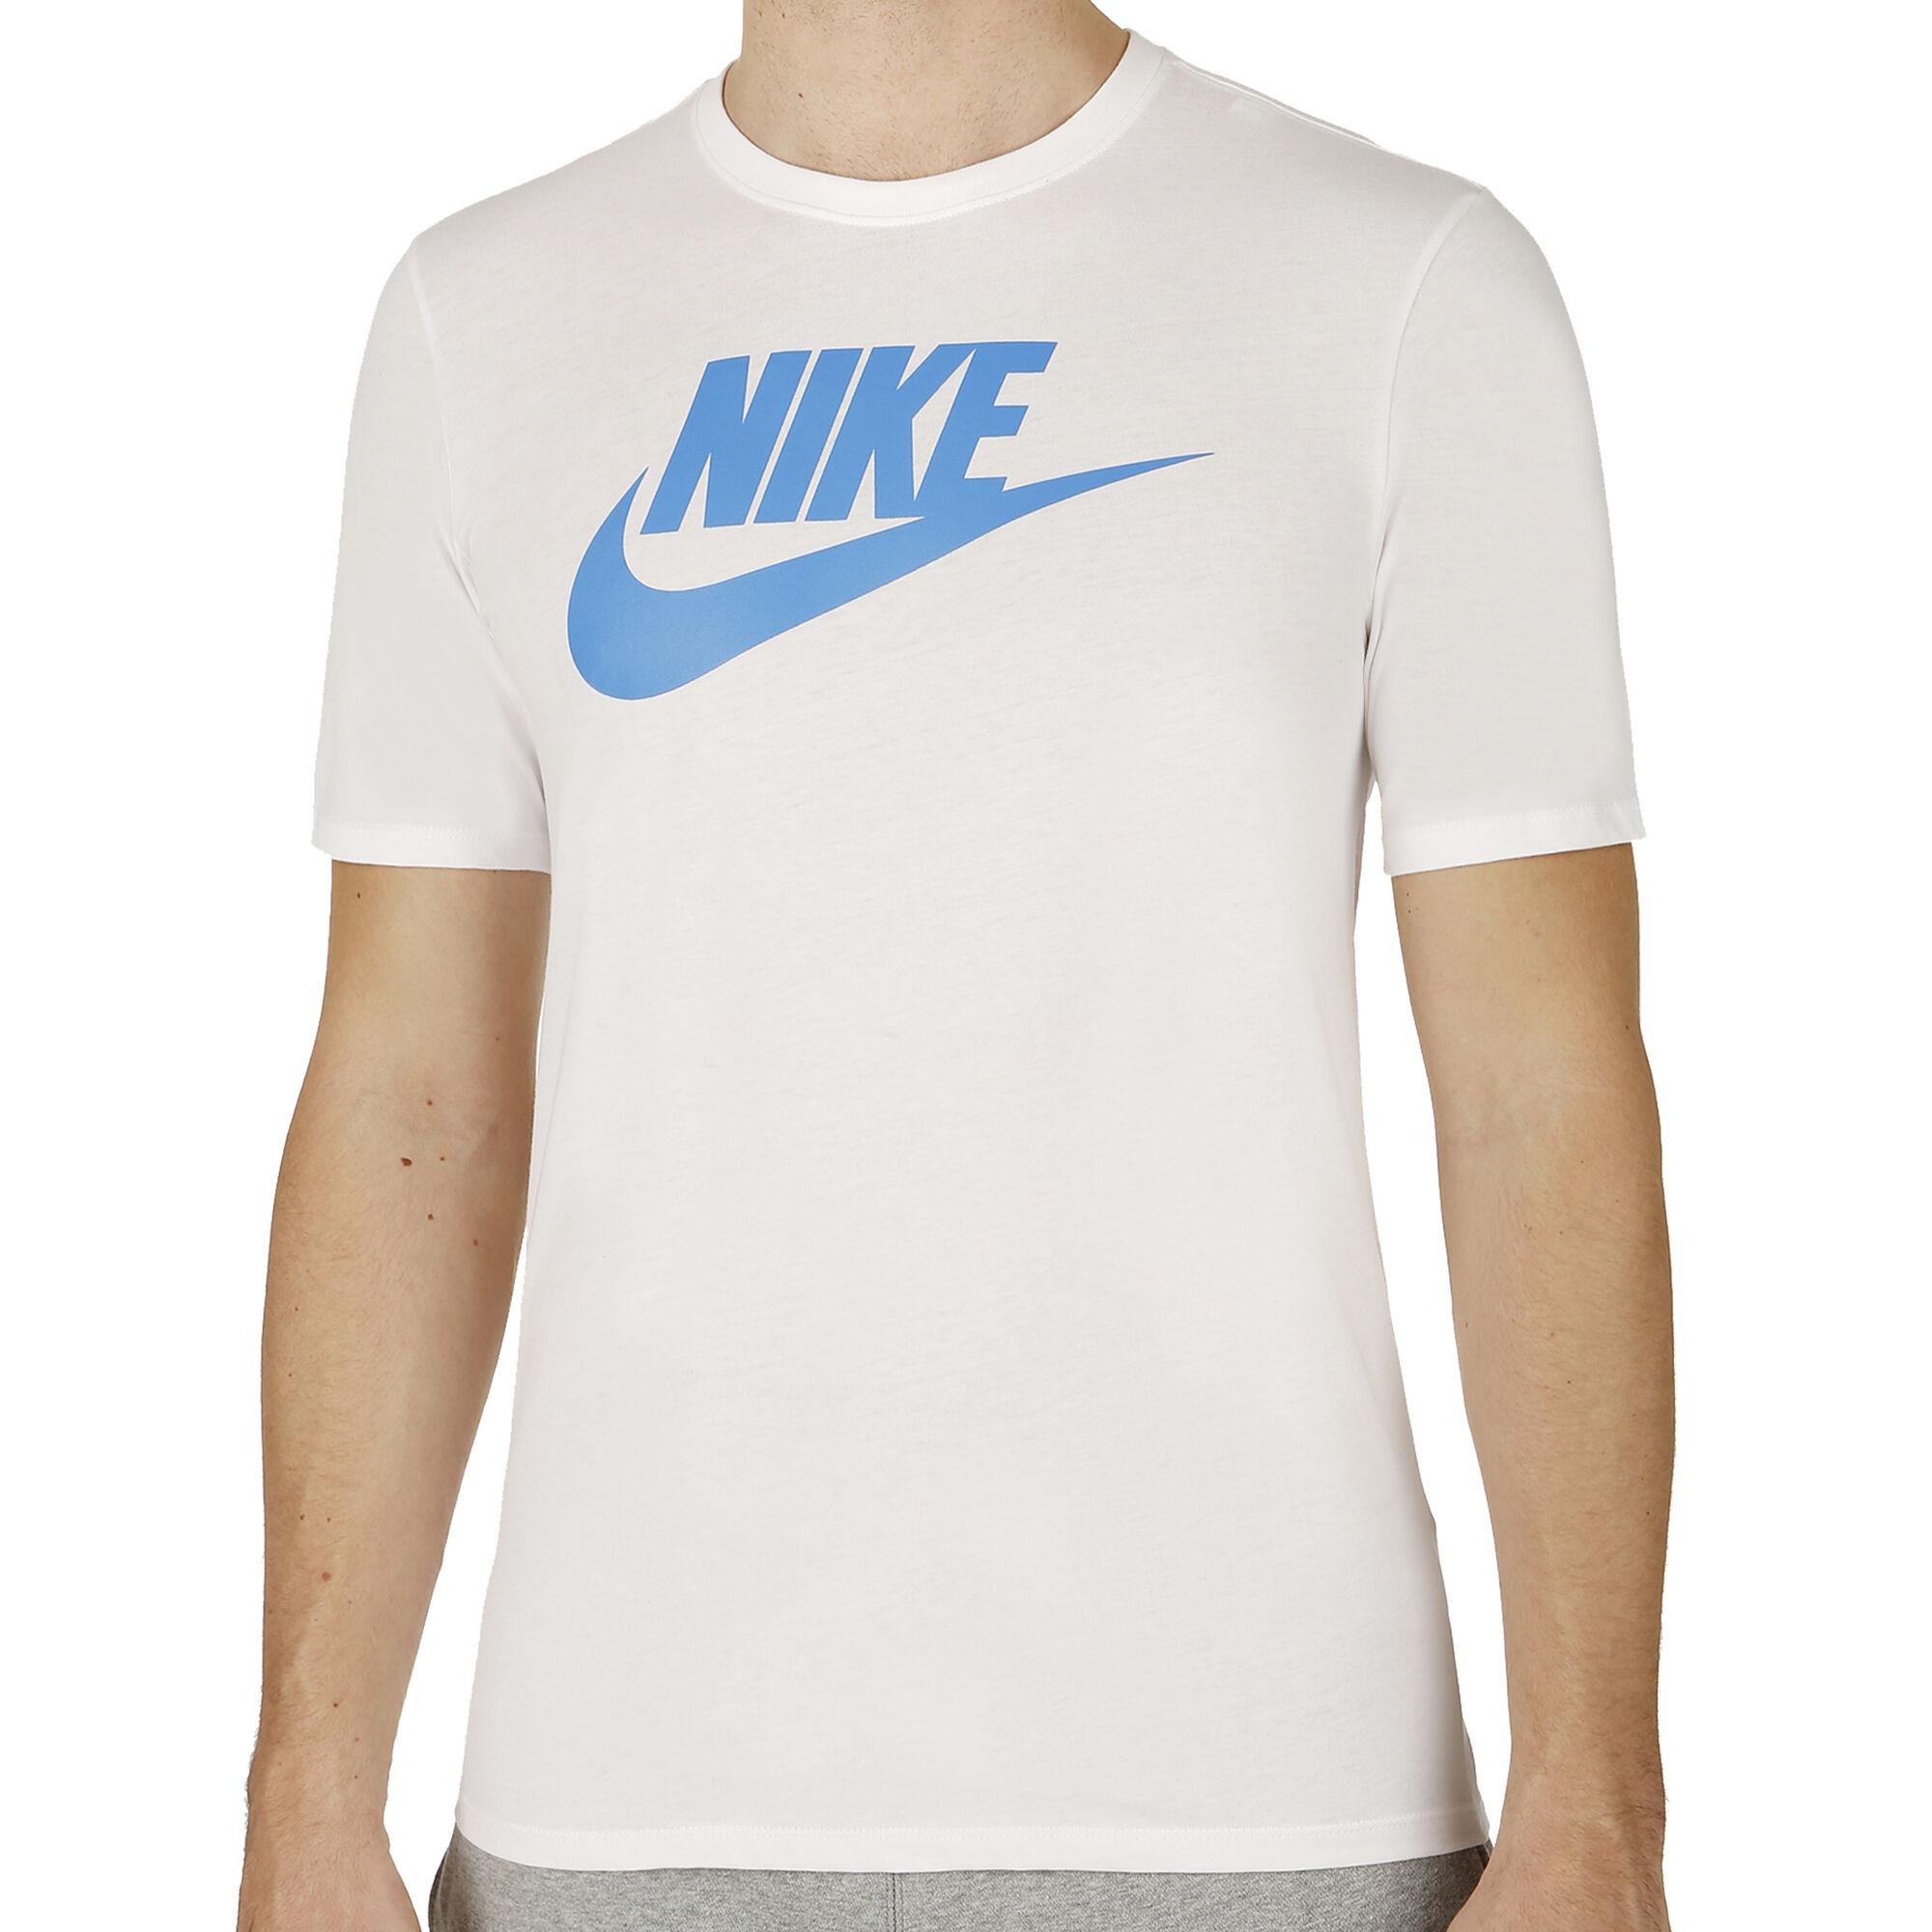 buy online fdfd6 27bc1 Nike Air Futura 1 Short Sleeve T Shirt Mens